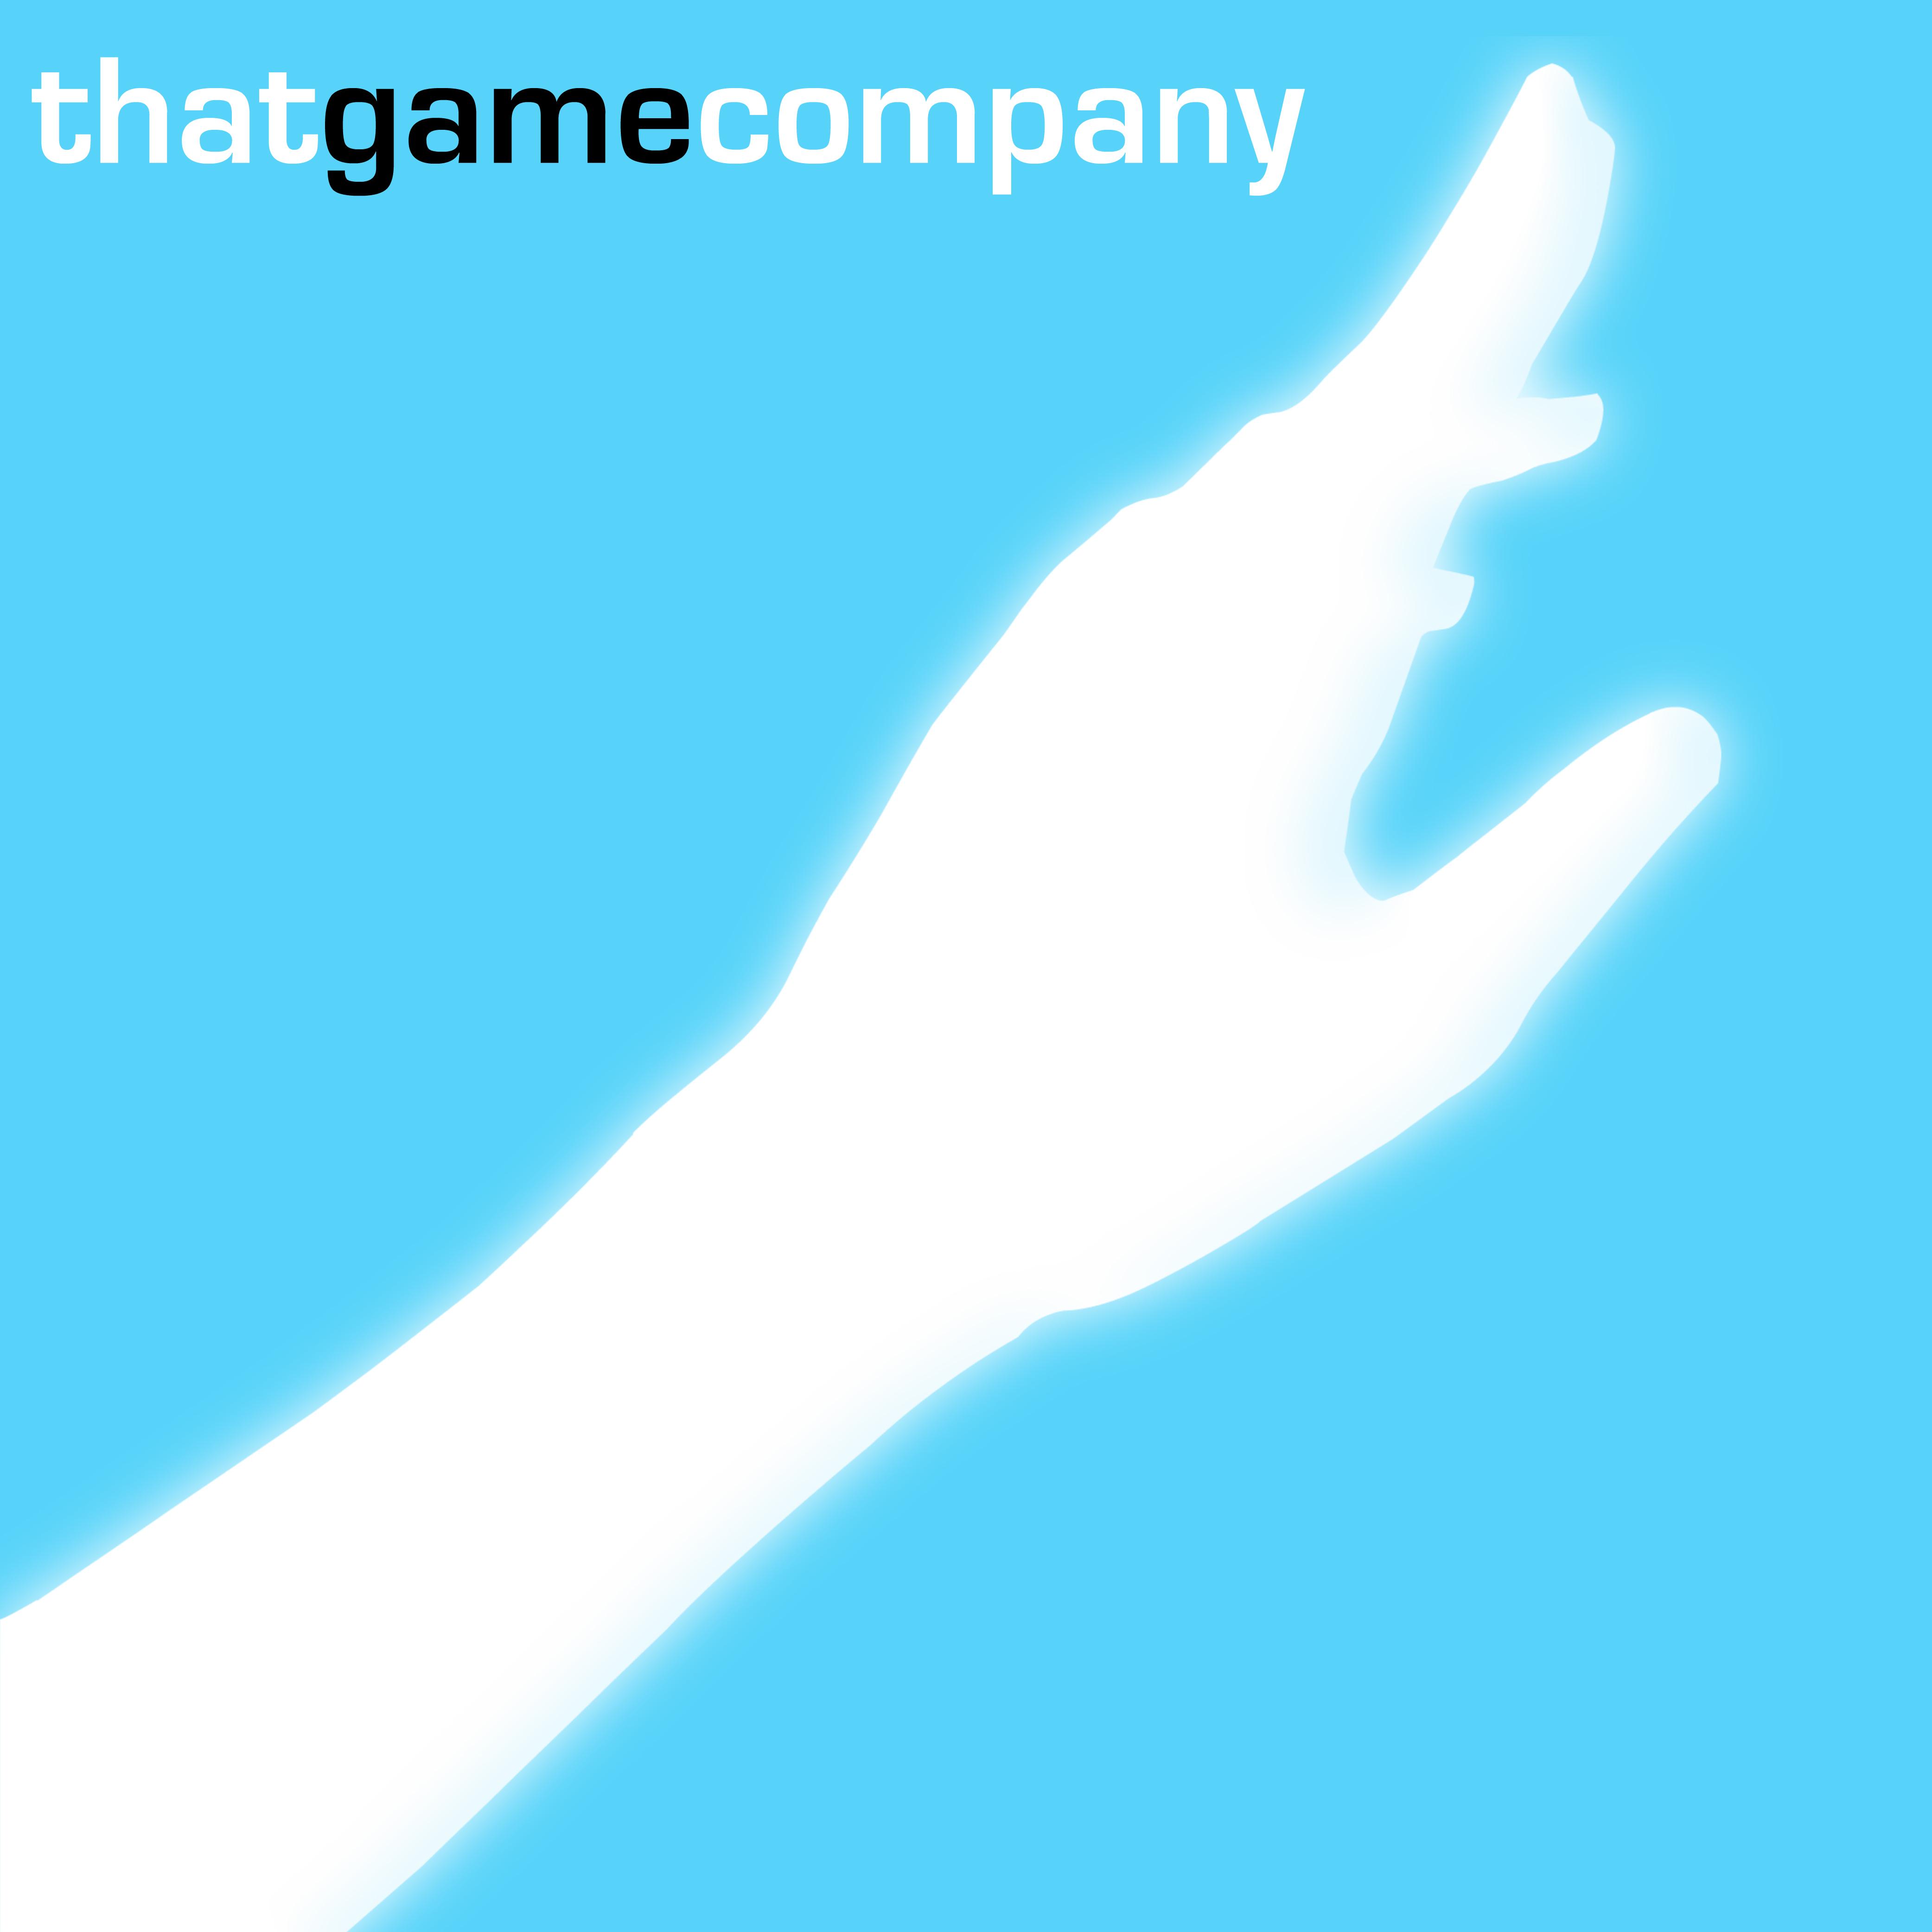 thatgamecompany's logo